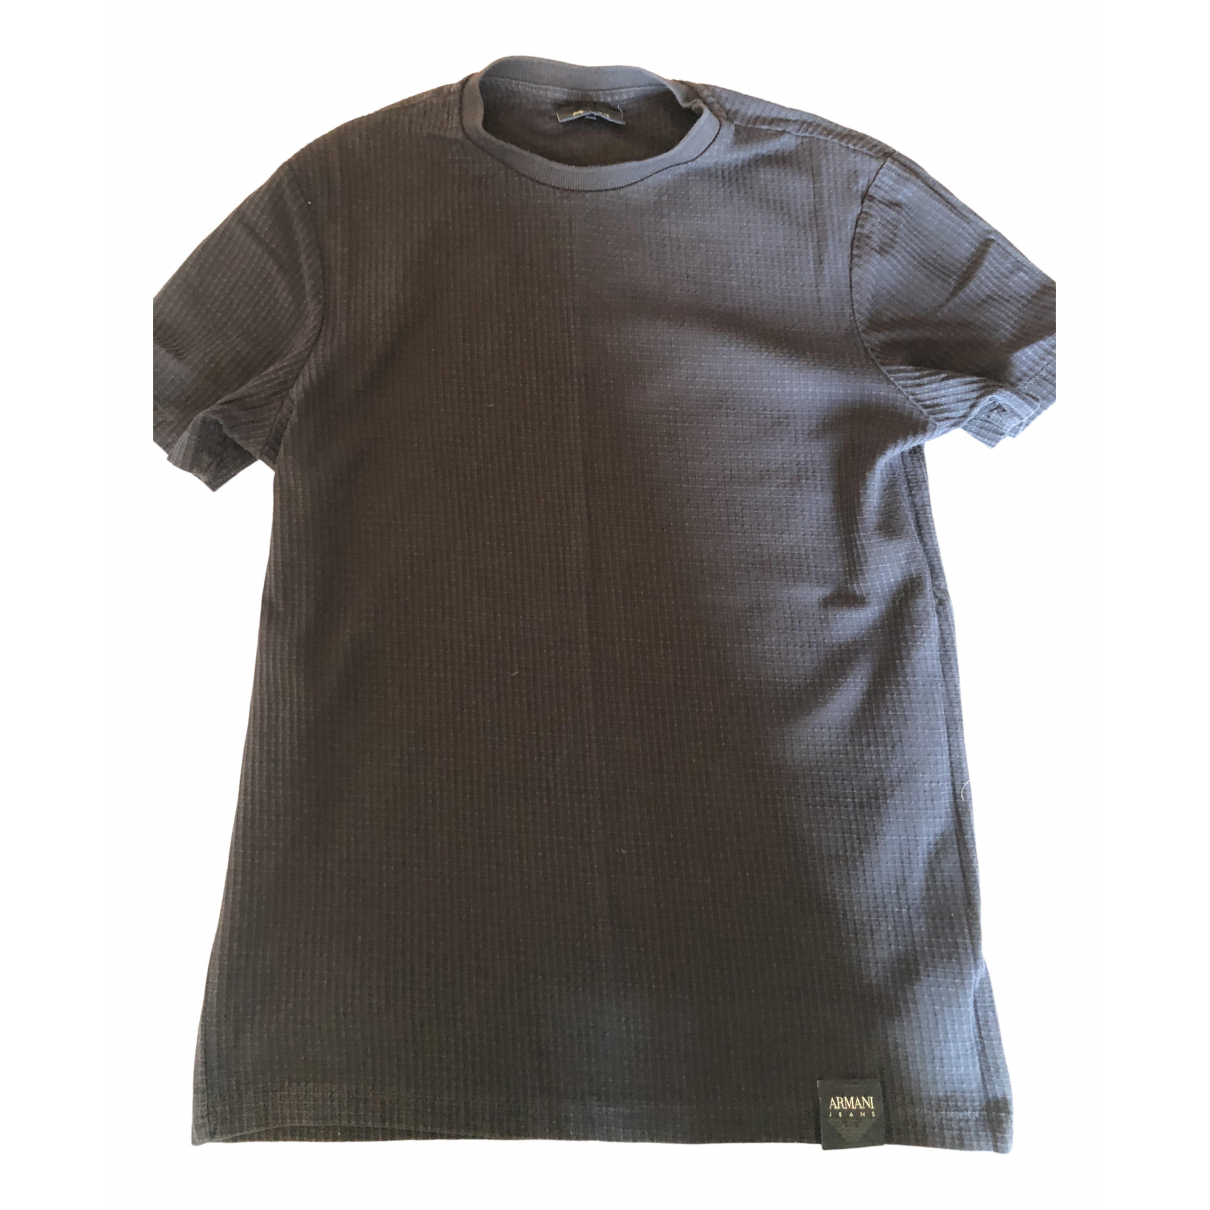 Armani Jeans \N Blue Cotton T-shirts for Men S International